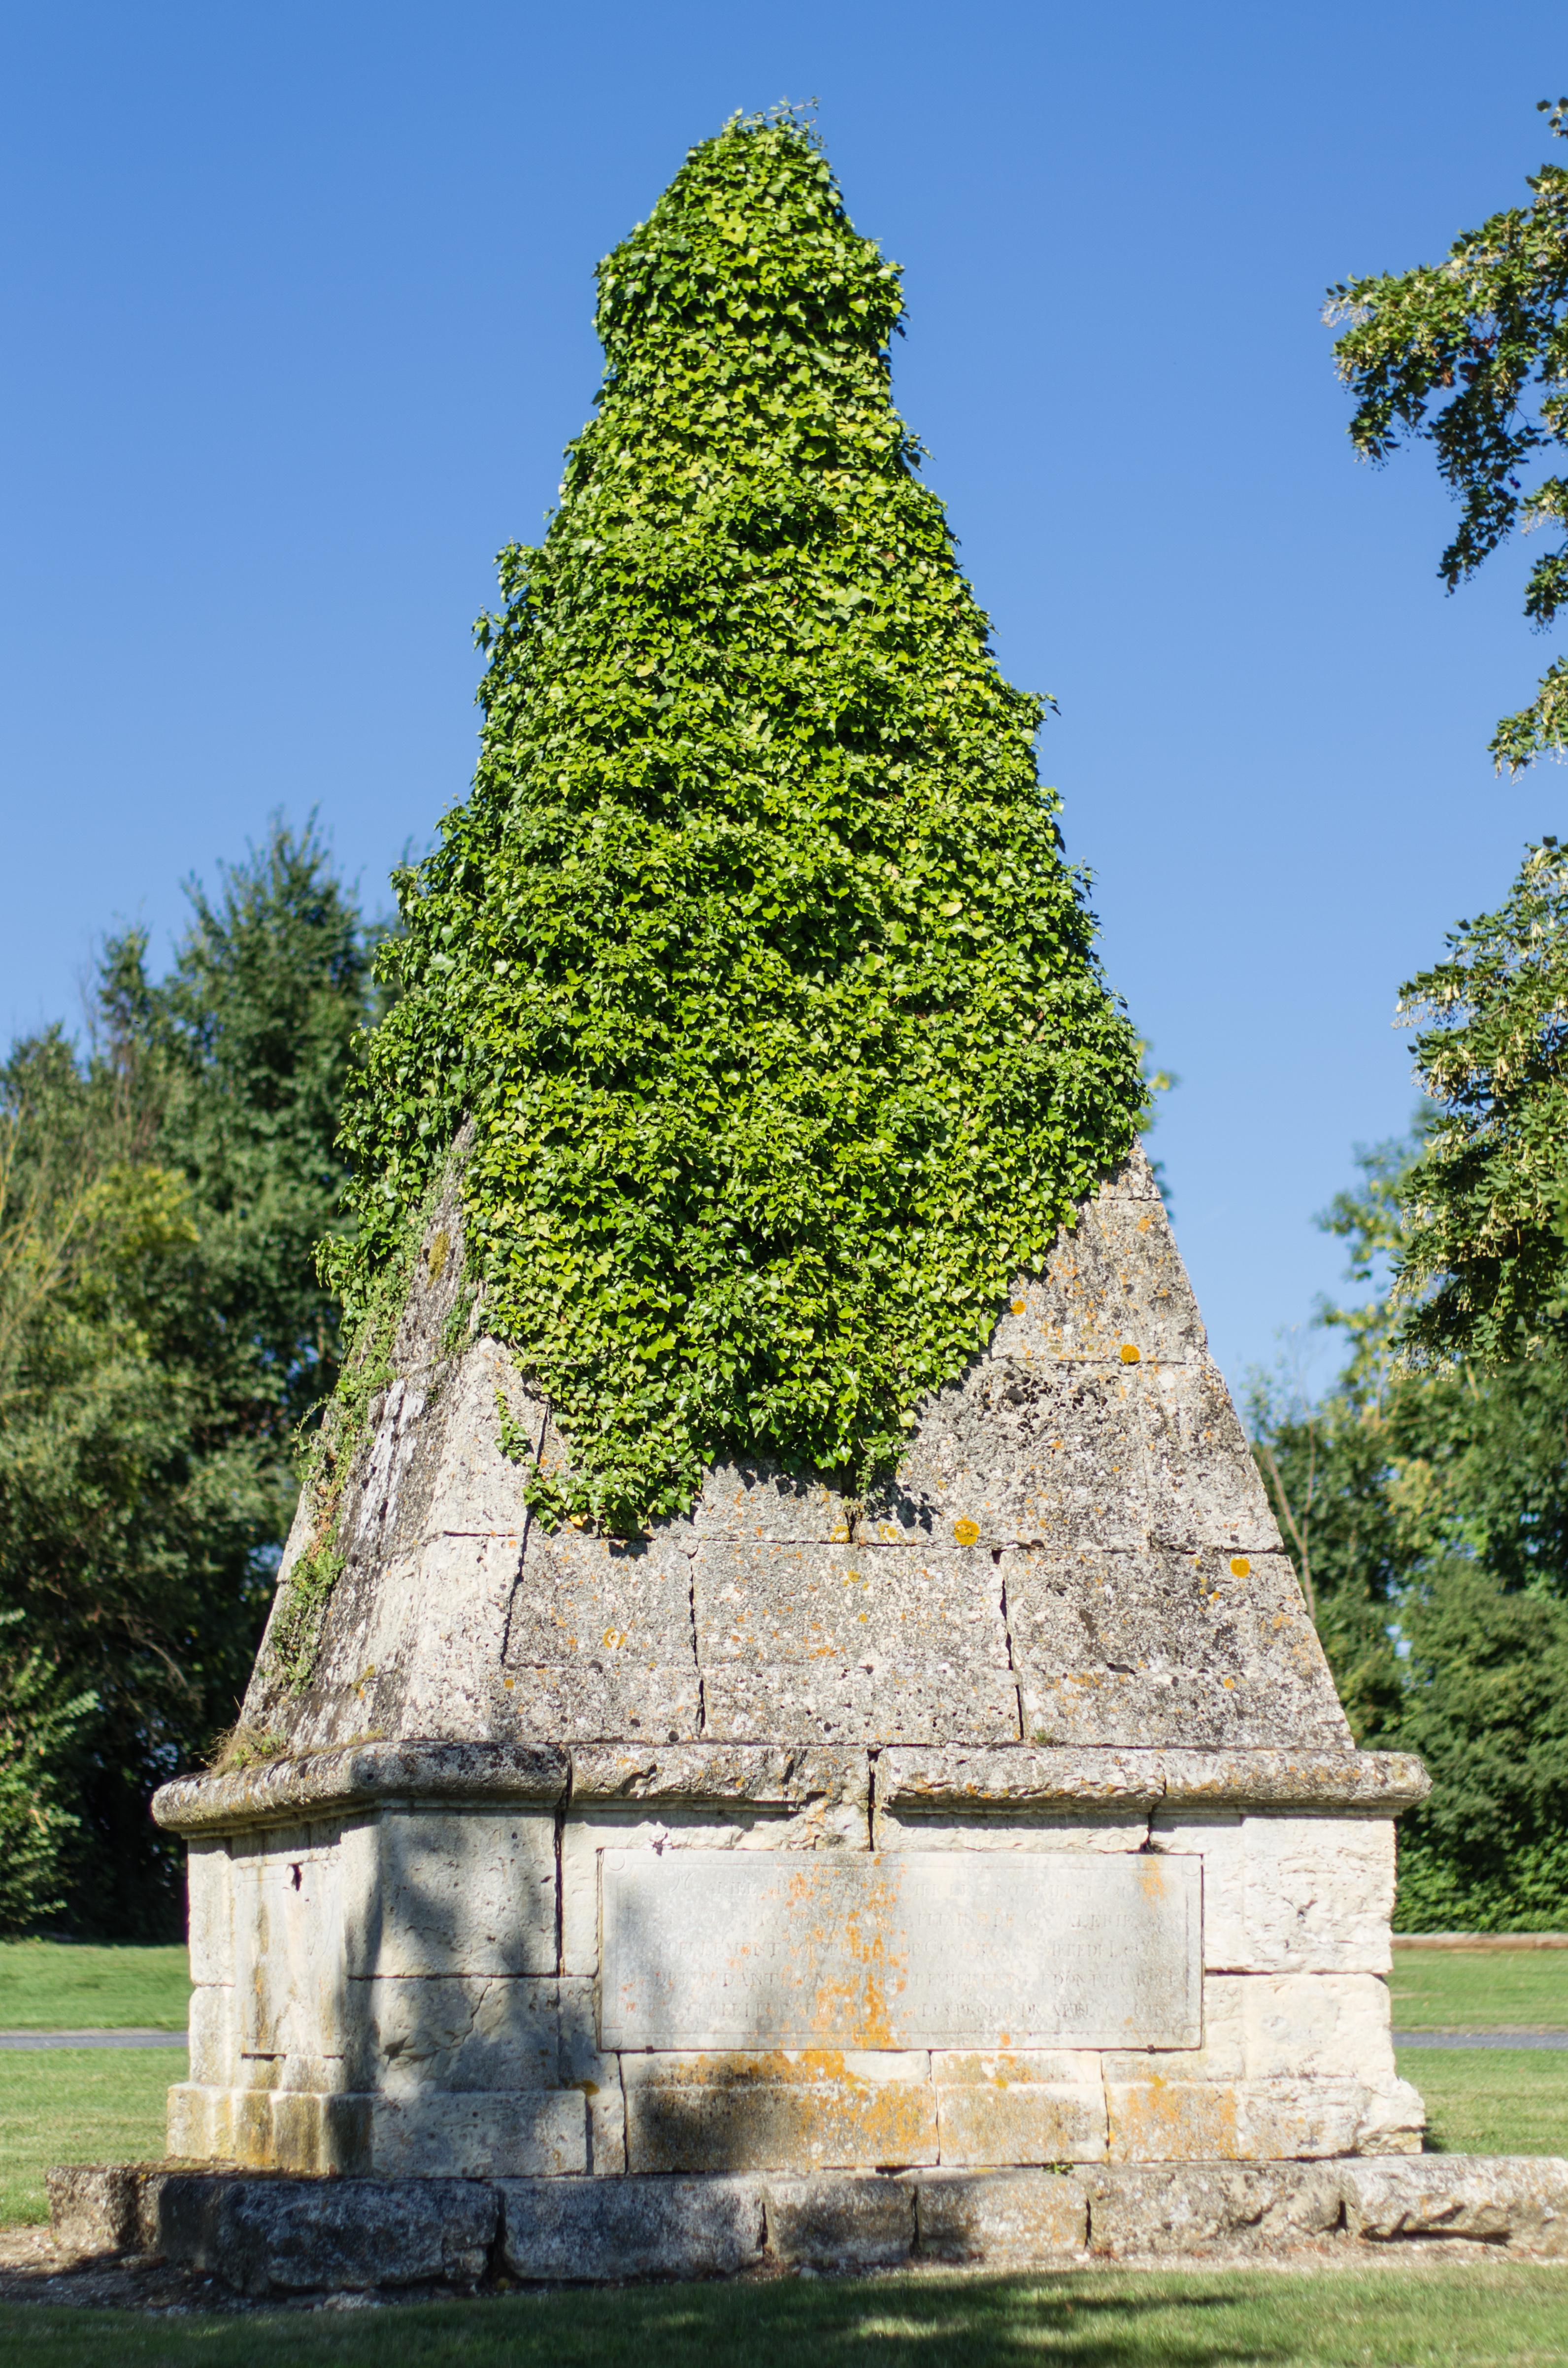 Gournay-sur-Aronde